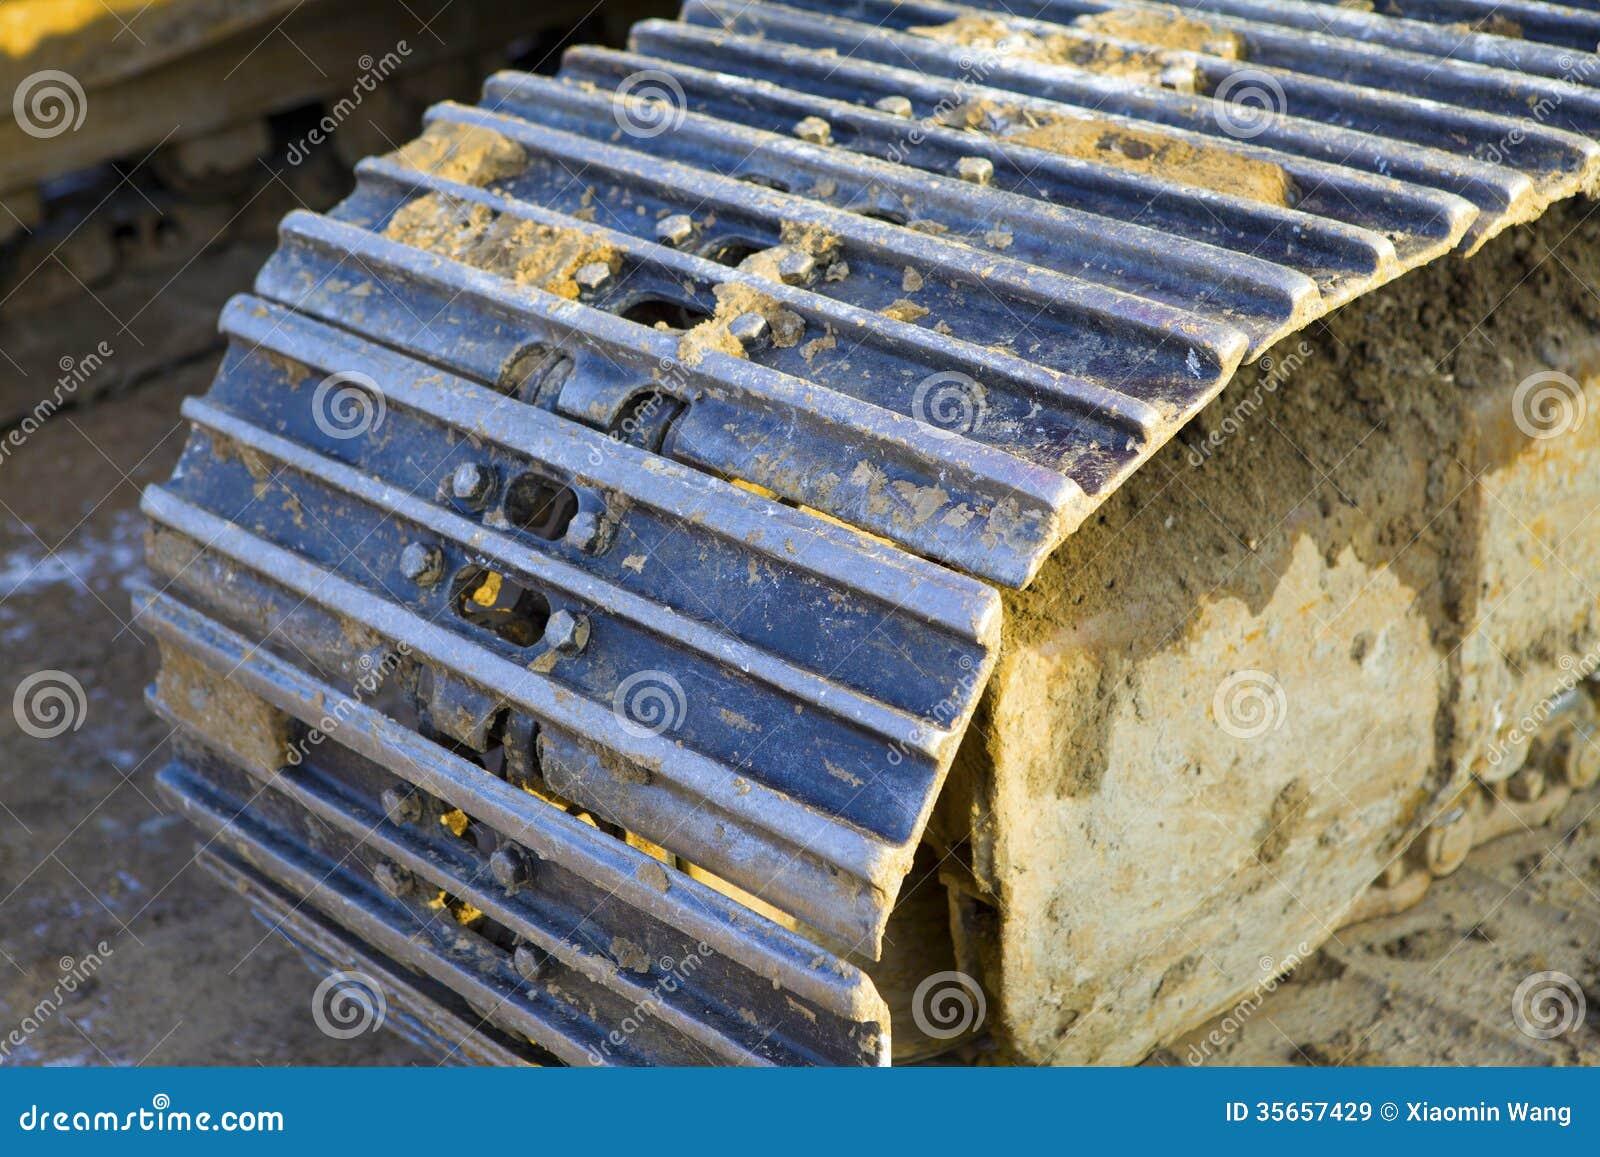 how to change excavator tracks